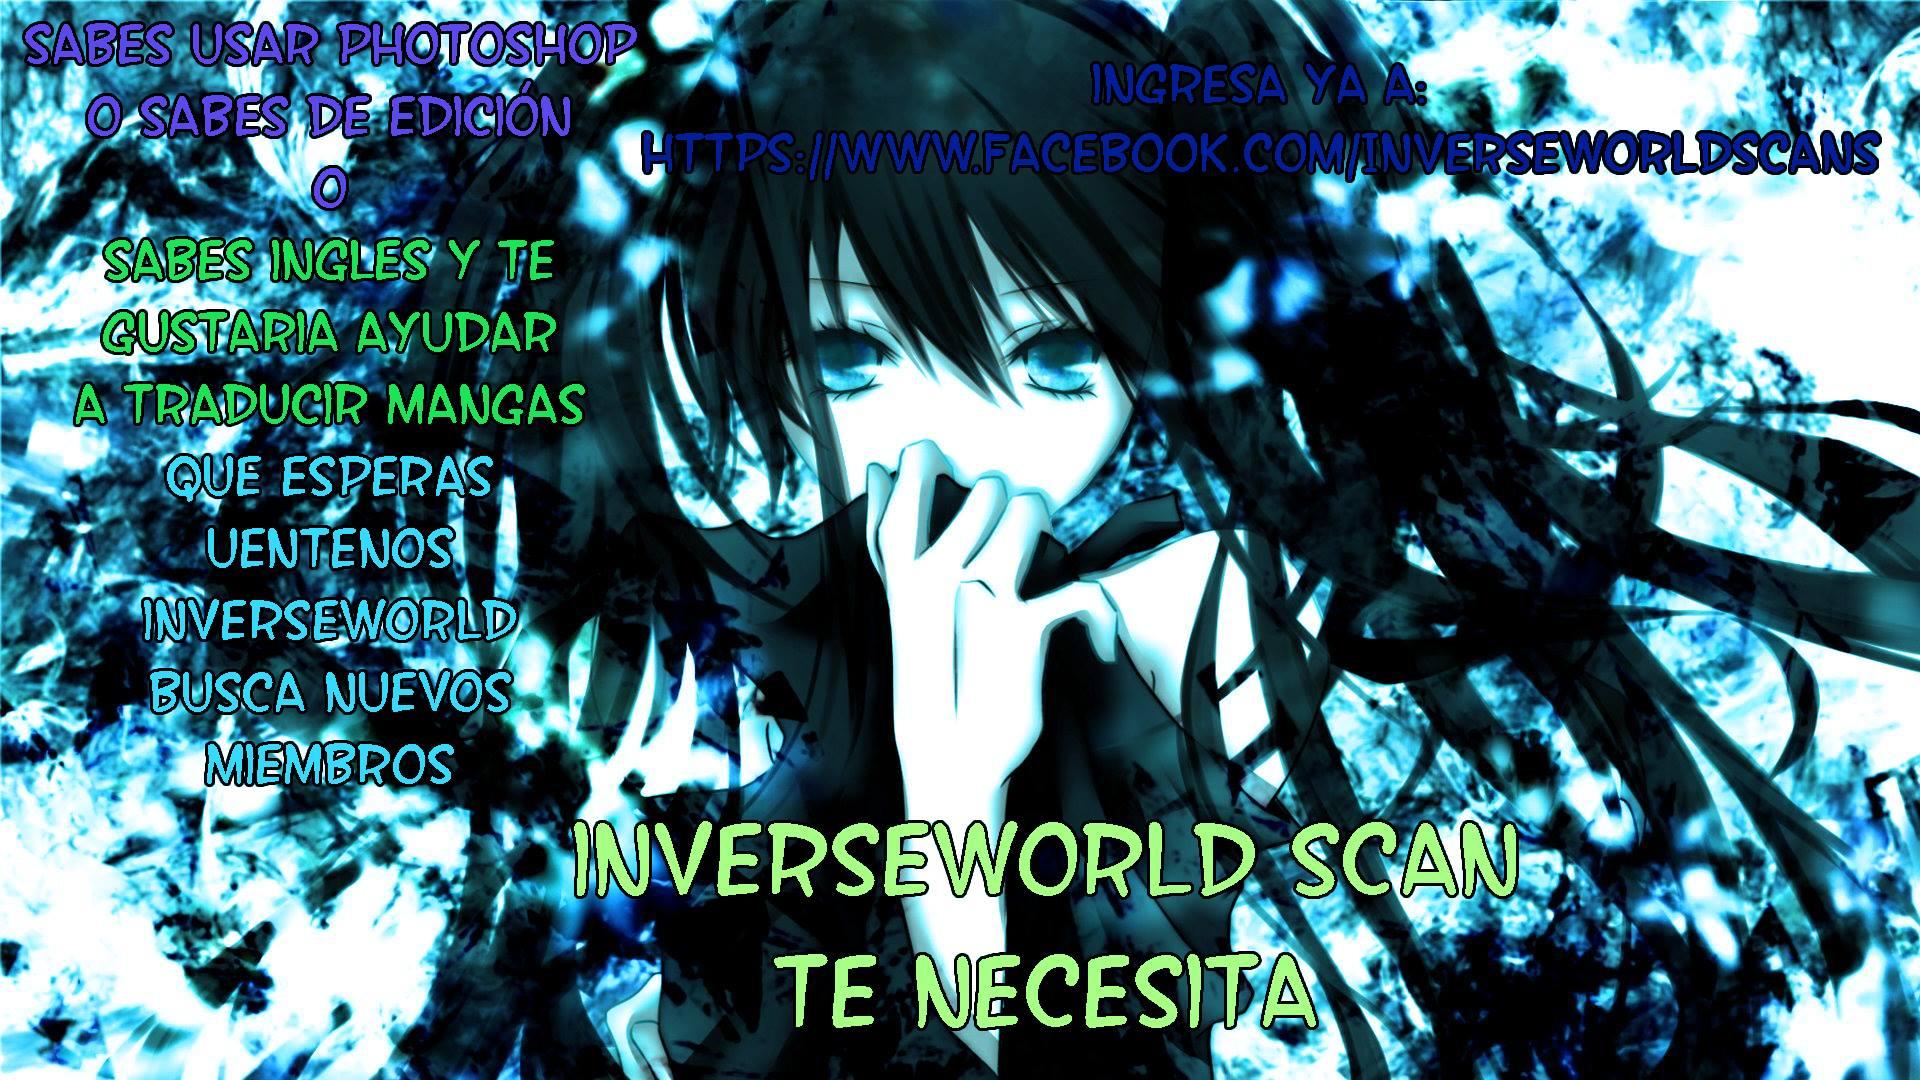 http://c5.ninemanga.com/es_manga/18/16210/415328/a203b951ba0c72dc08dd659cf717a012.jpg Page 1